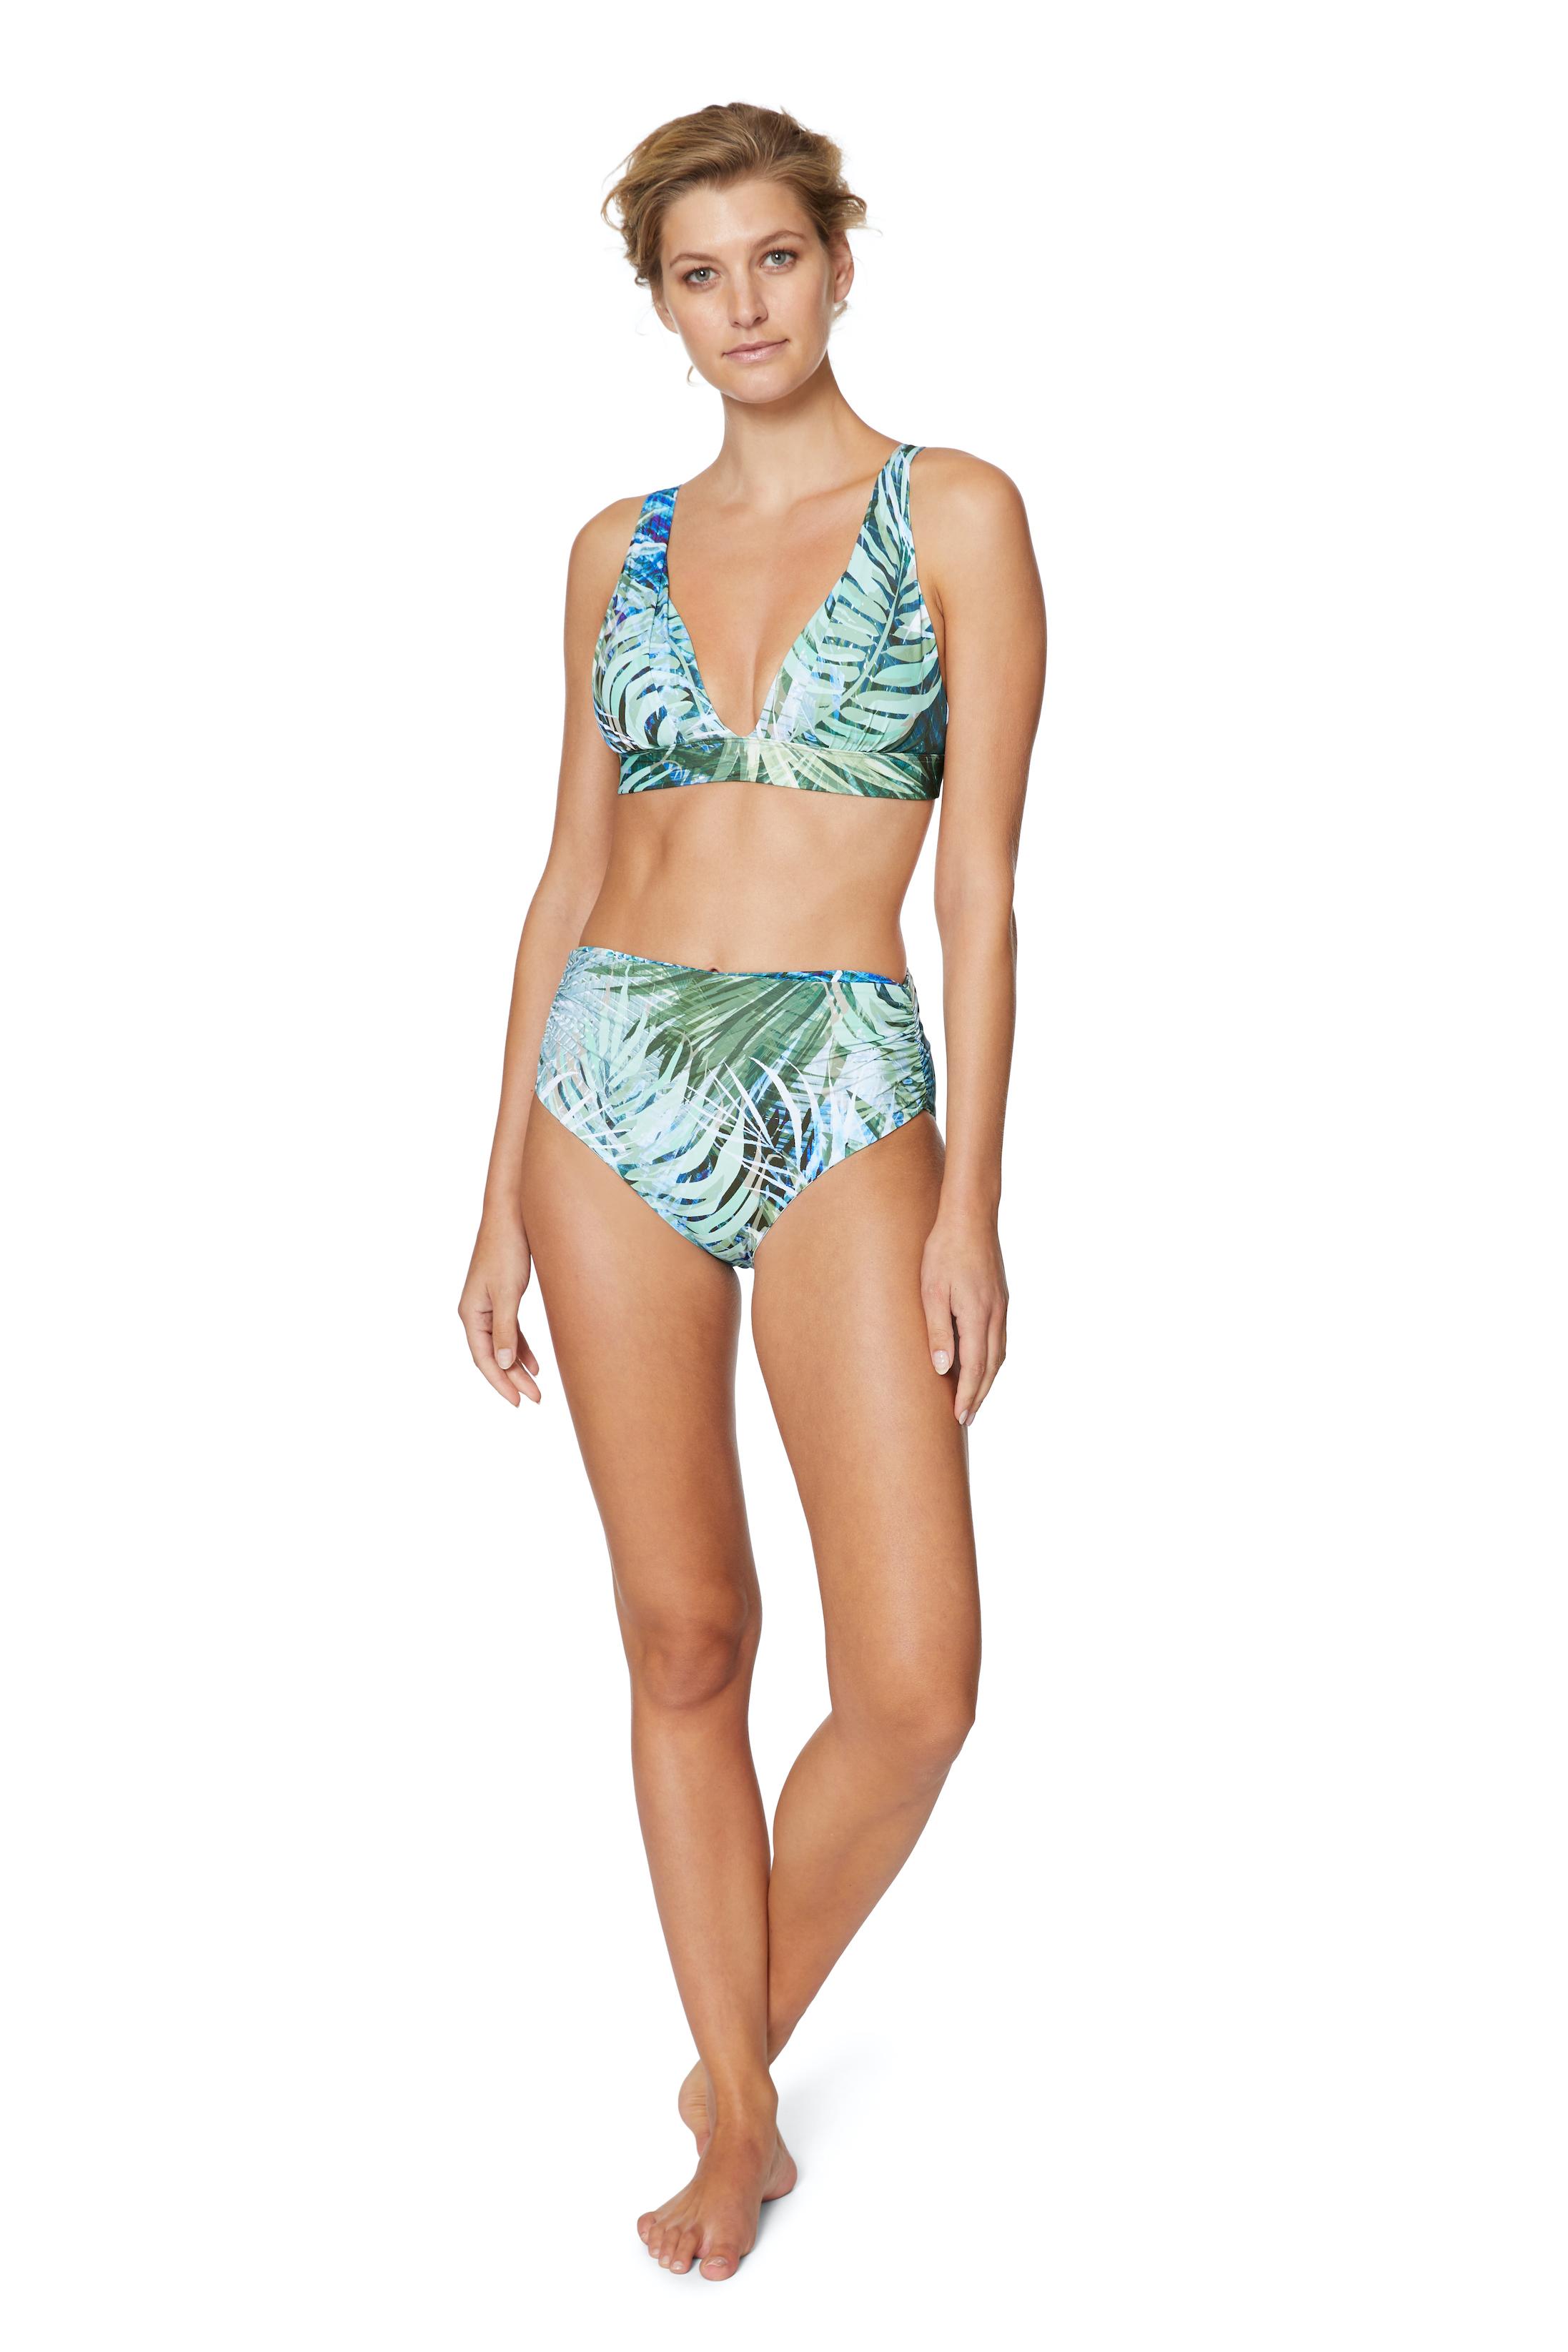 Tahari® Camo Palm Shirred High Waist Swimsuit Bottom -Green - Front